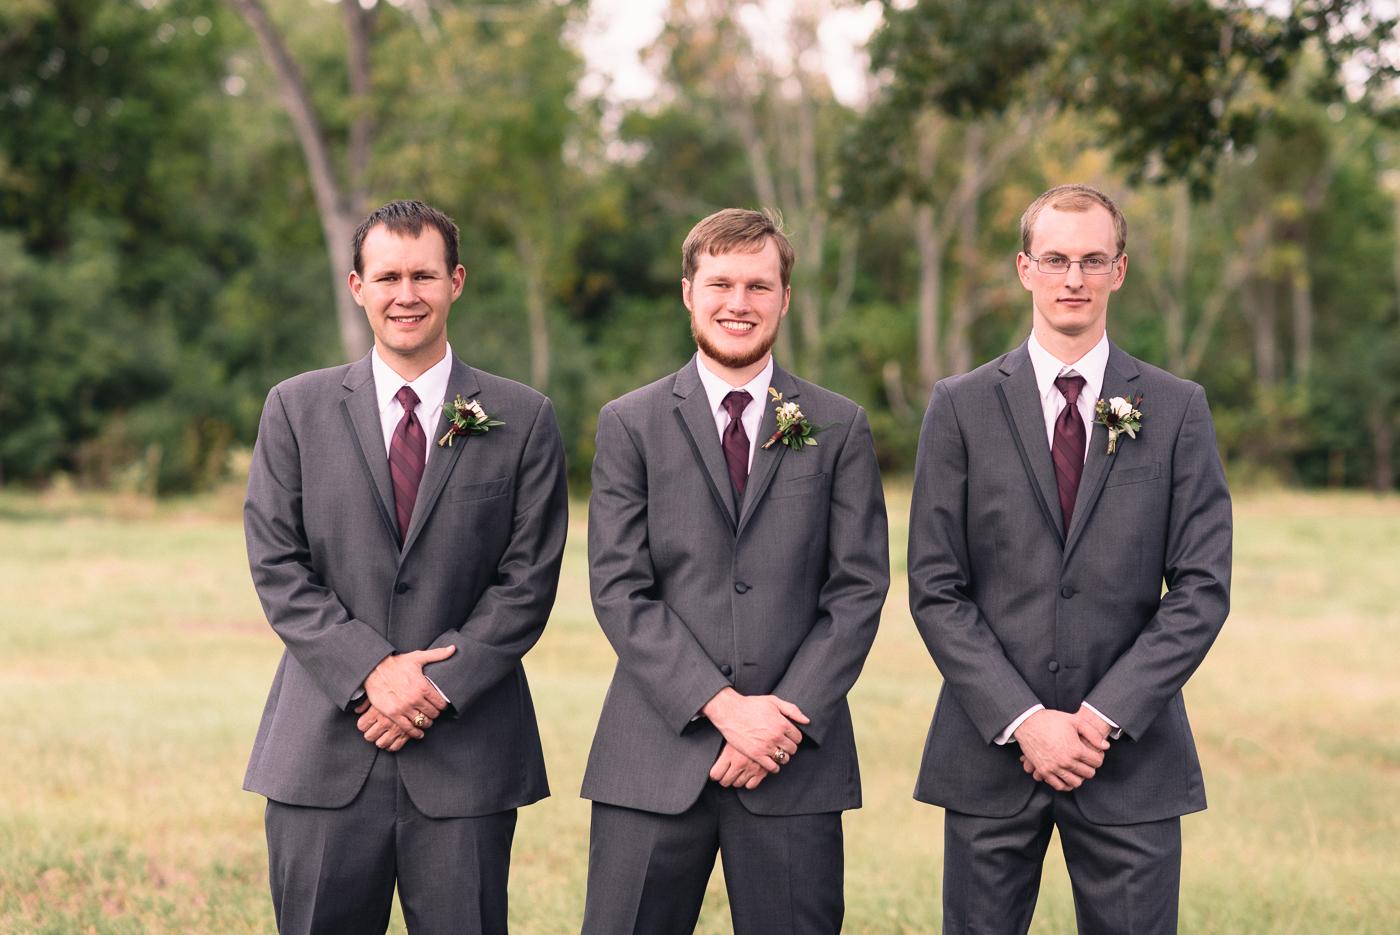 Groom and groomsmen portrait cousins boutonniere suit maroon dapper smile